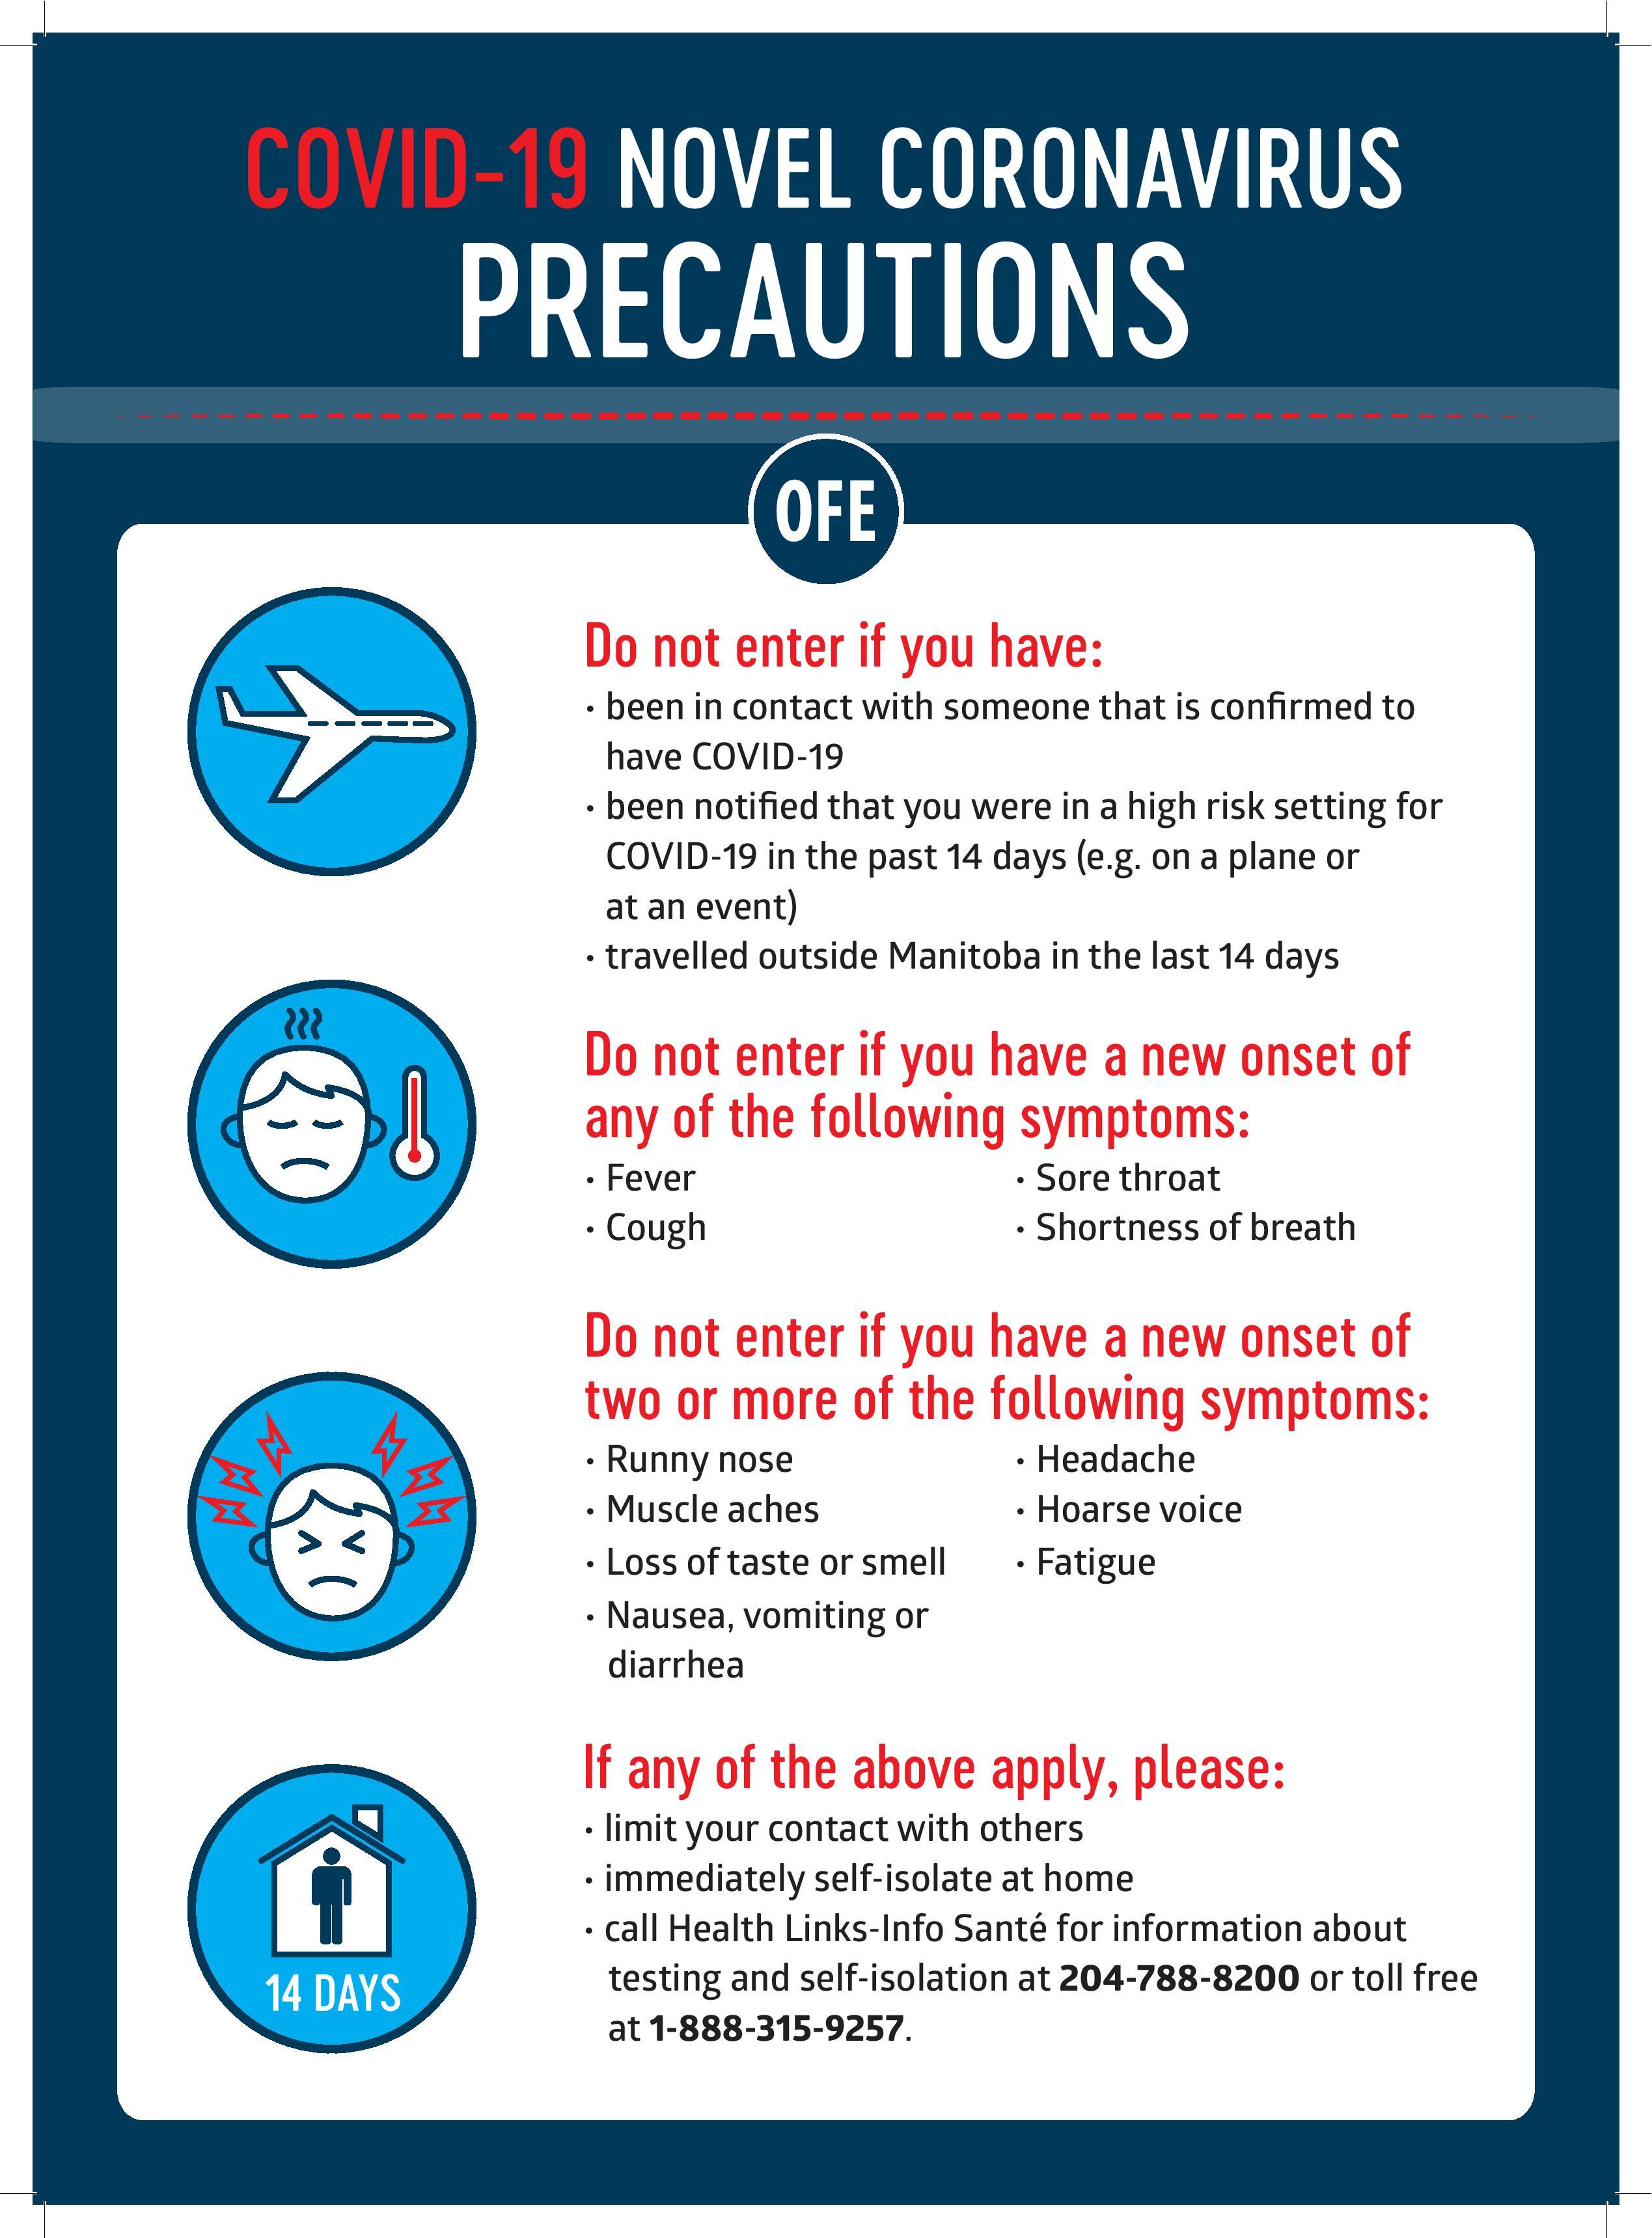 COVID-19 List of Precautions